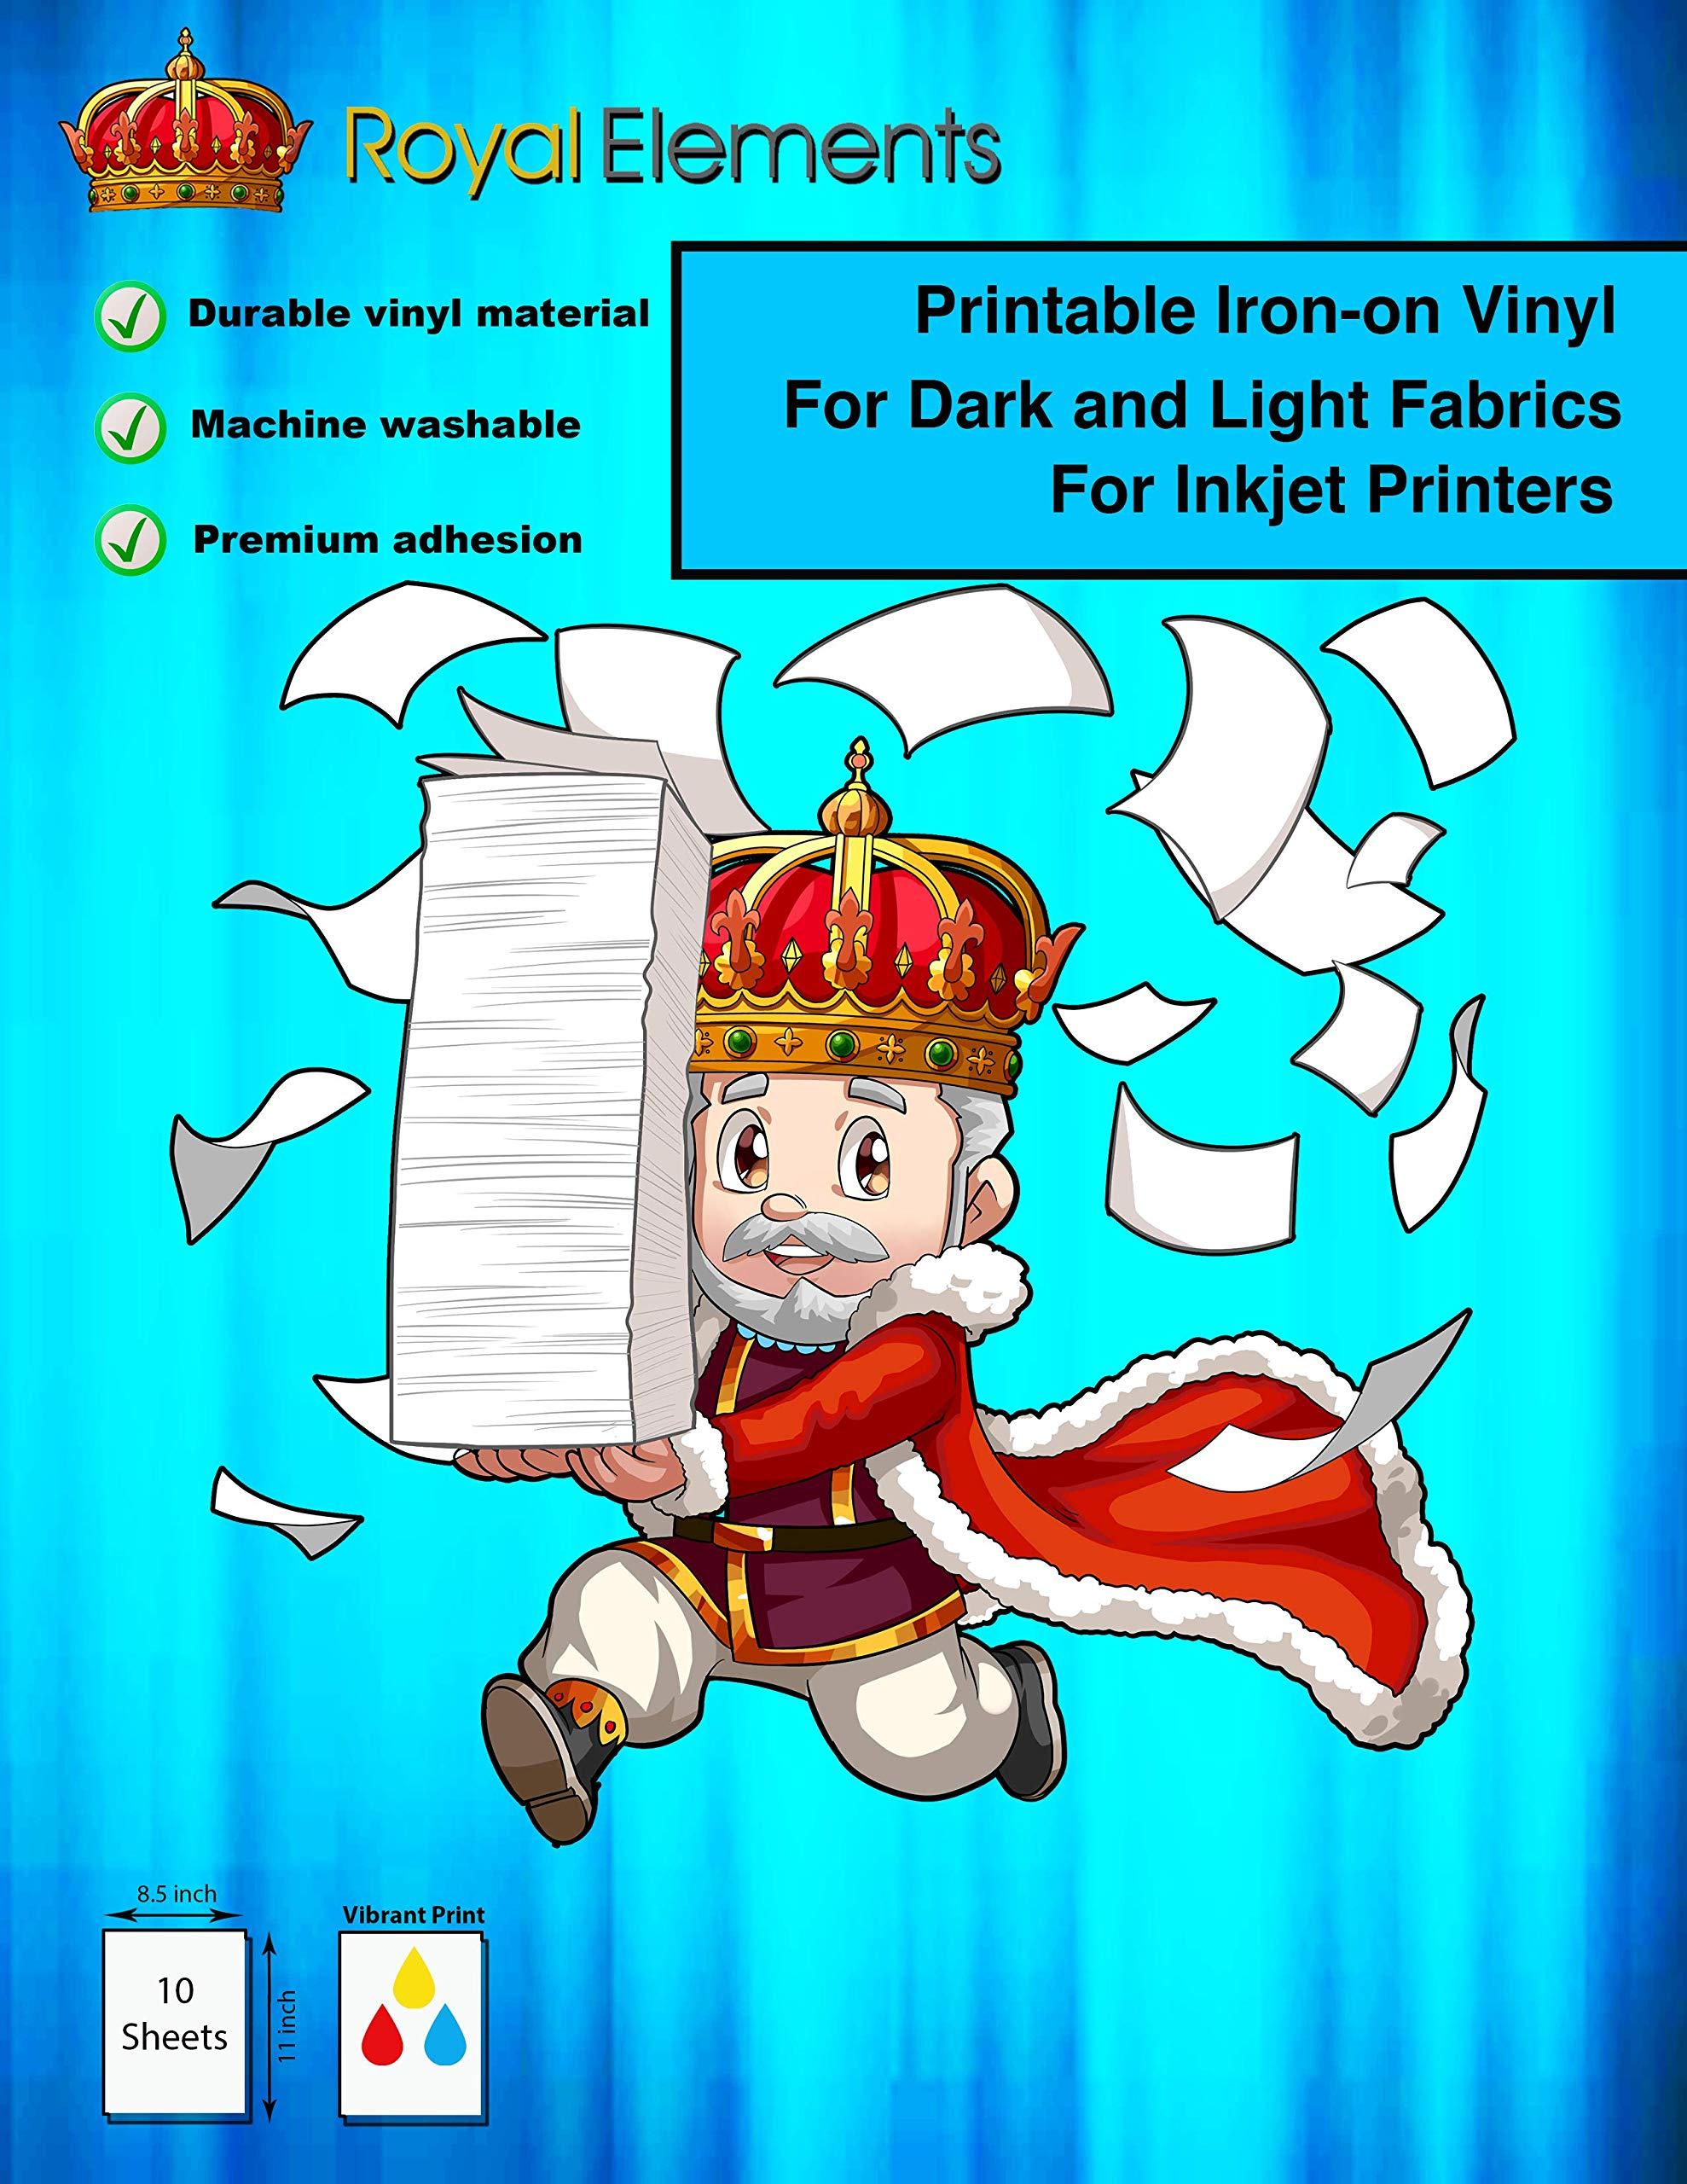 Royal Elements Printable Heat Transfer Vinyl for Dark Fabrics - 10 Sheets for Inkjet Printers